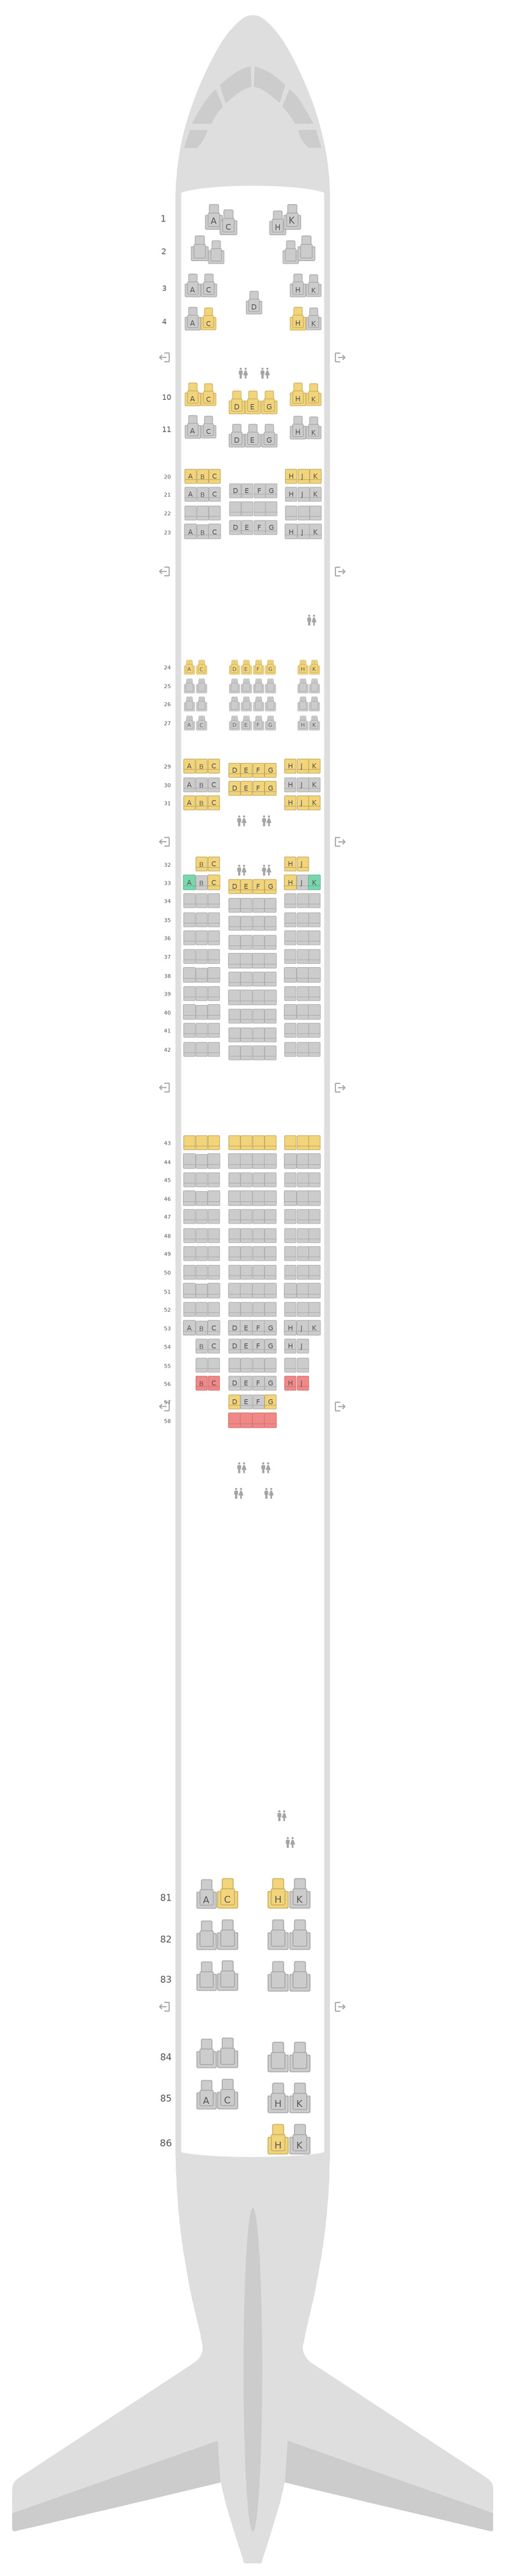 Sitzplan Boeing 747-400 (744) v1 Lufthansa